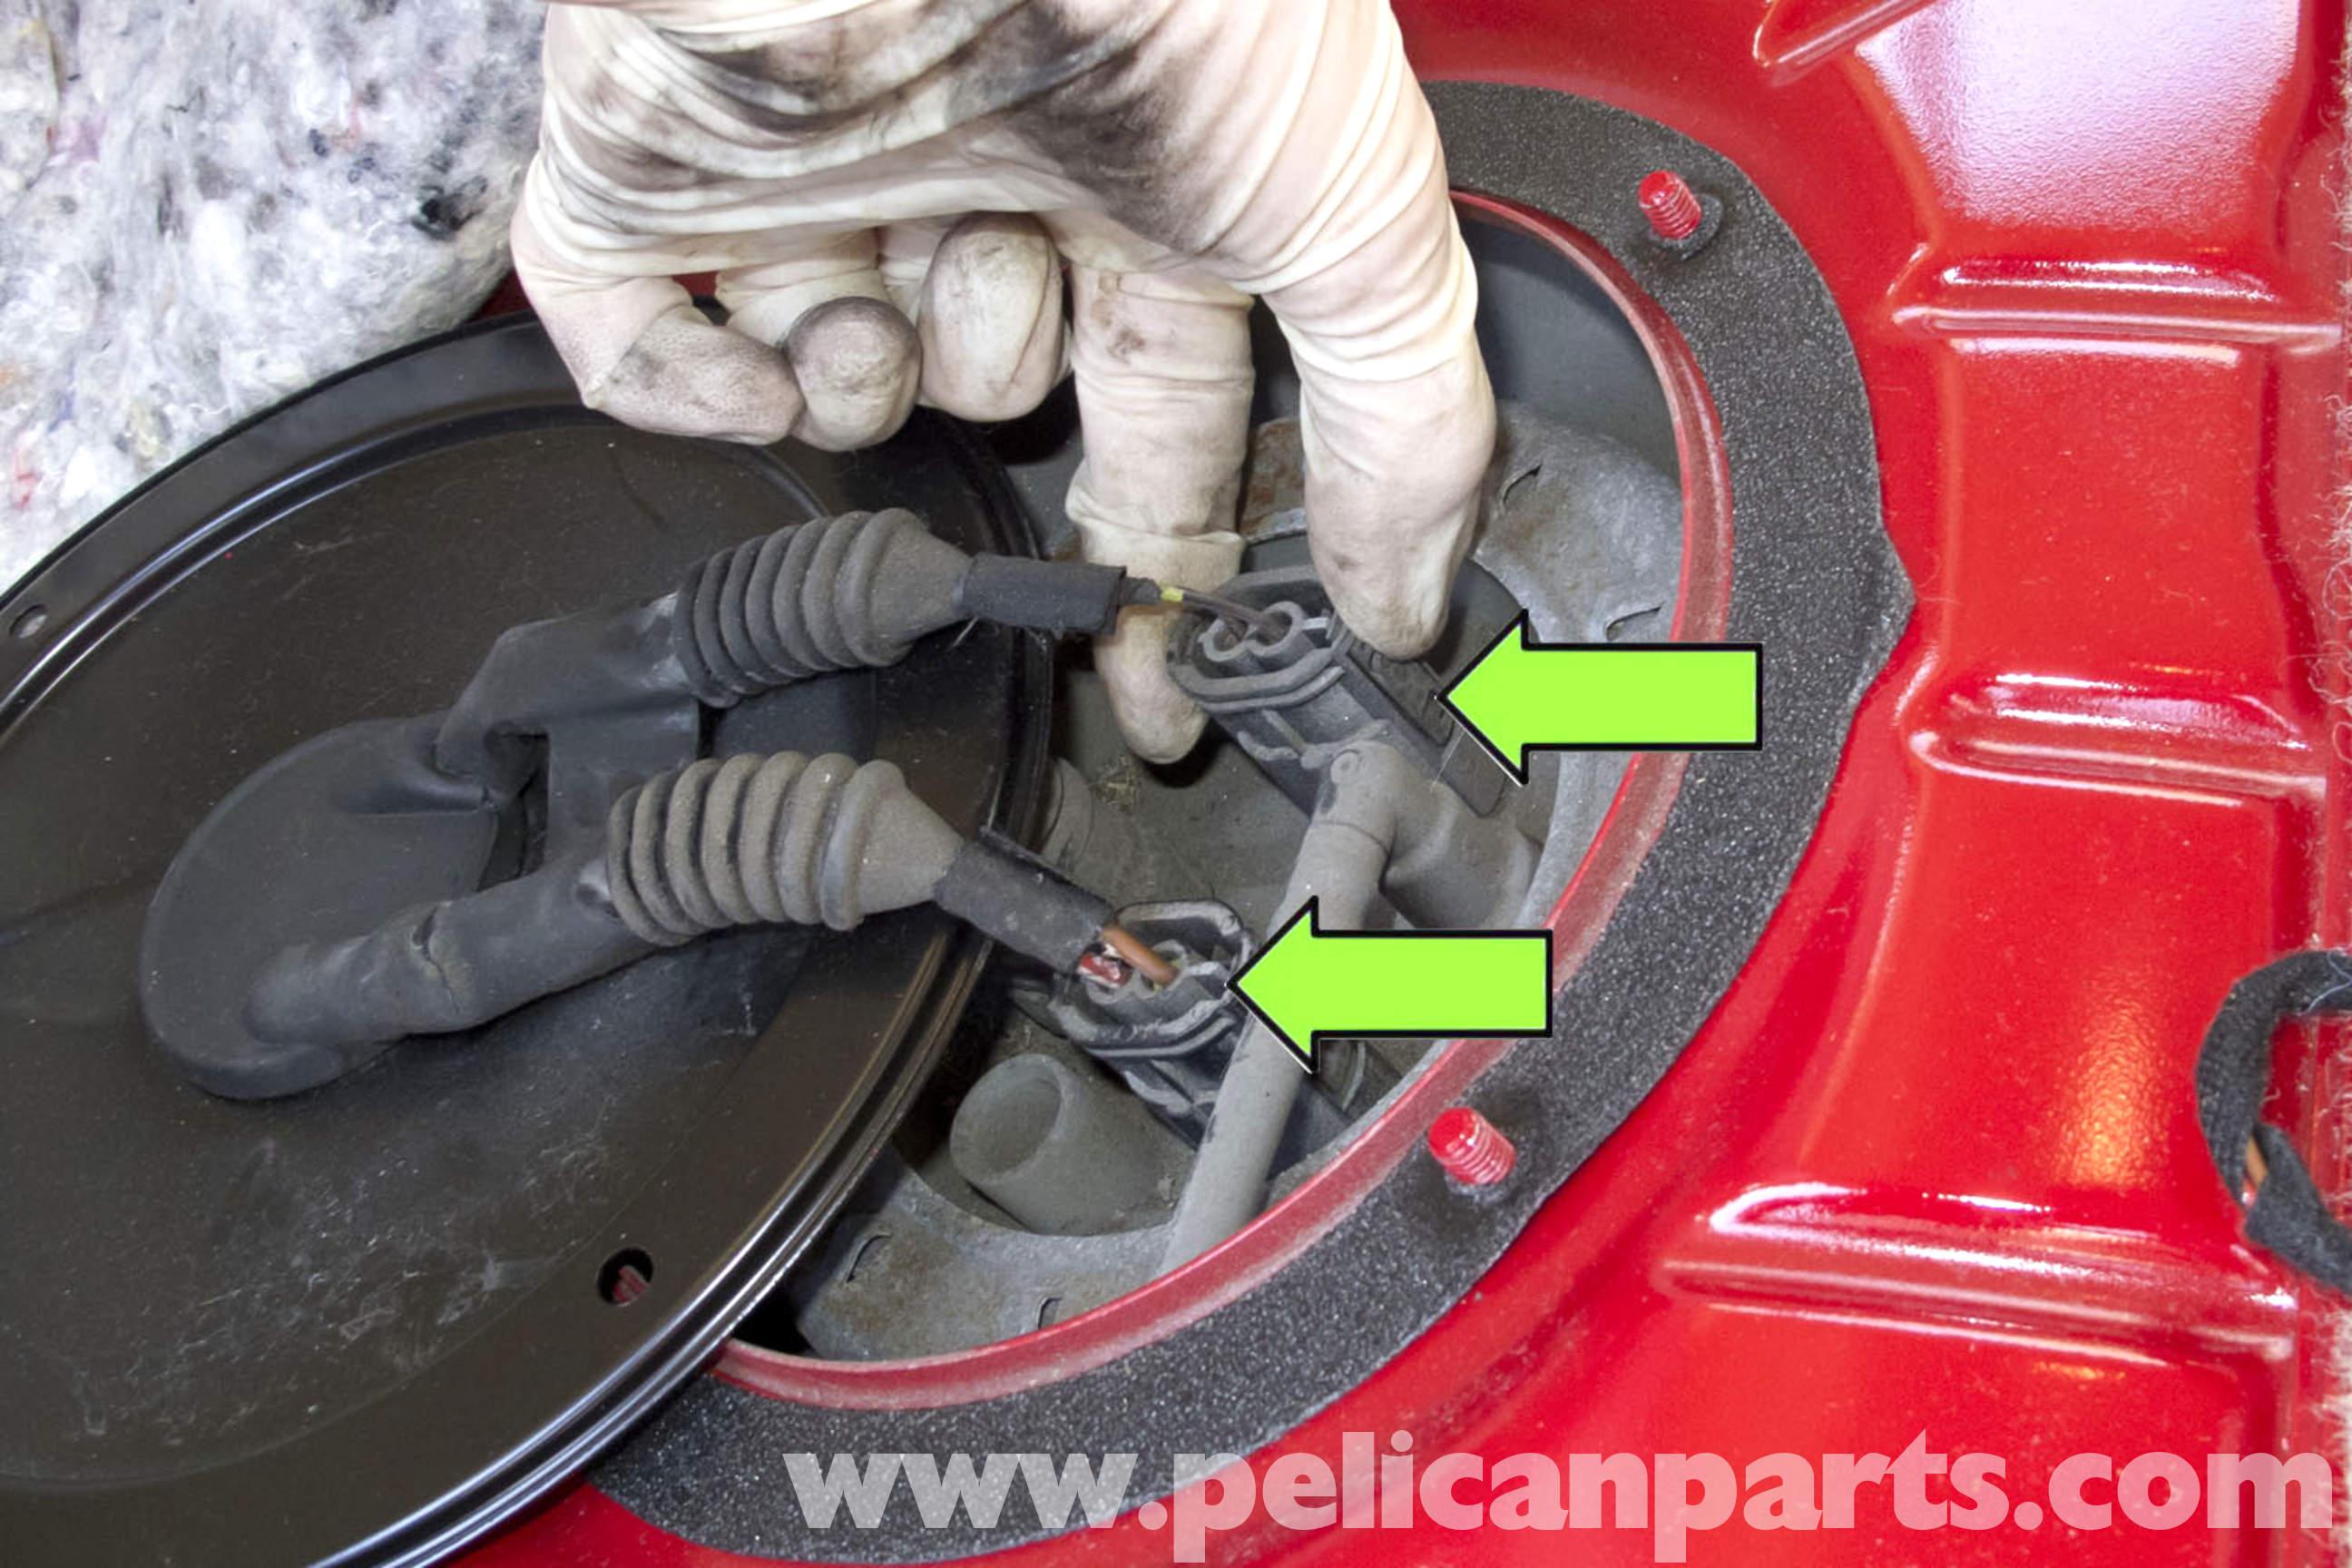 Bmw E90 Fuel Pump Replacement E91 E92 E93 Pelican Parts Diy 2001 Mitsubishi Eclipse Filter Large Image Extra